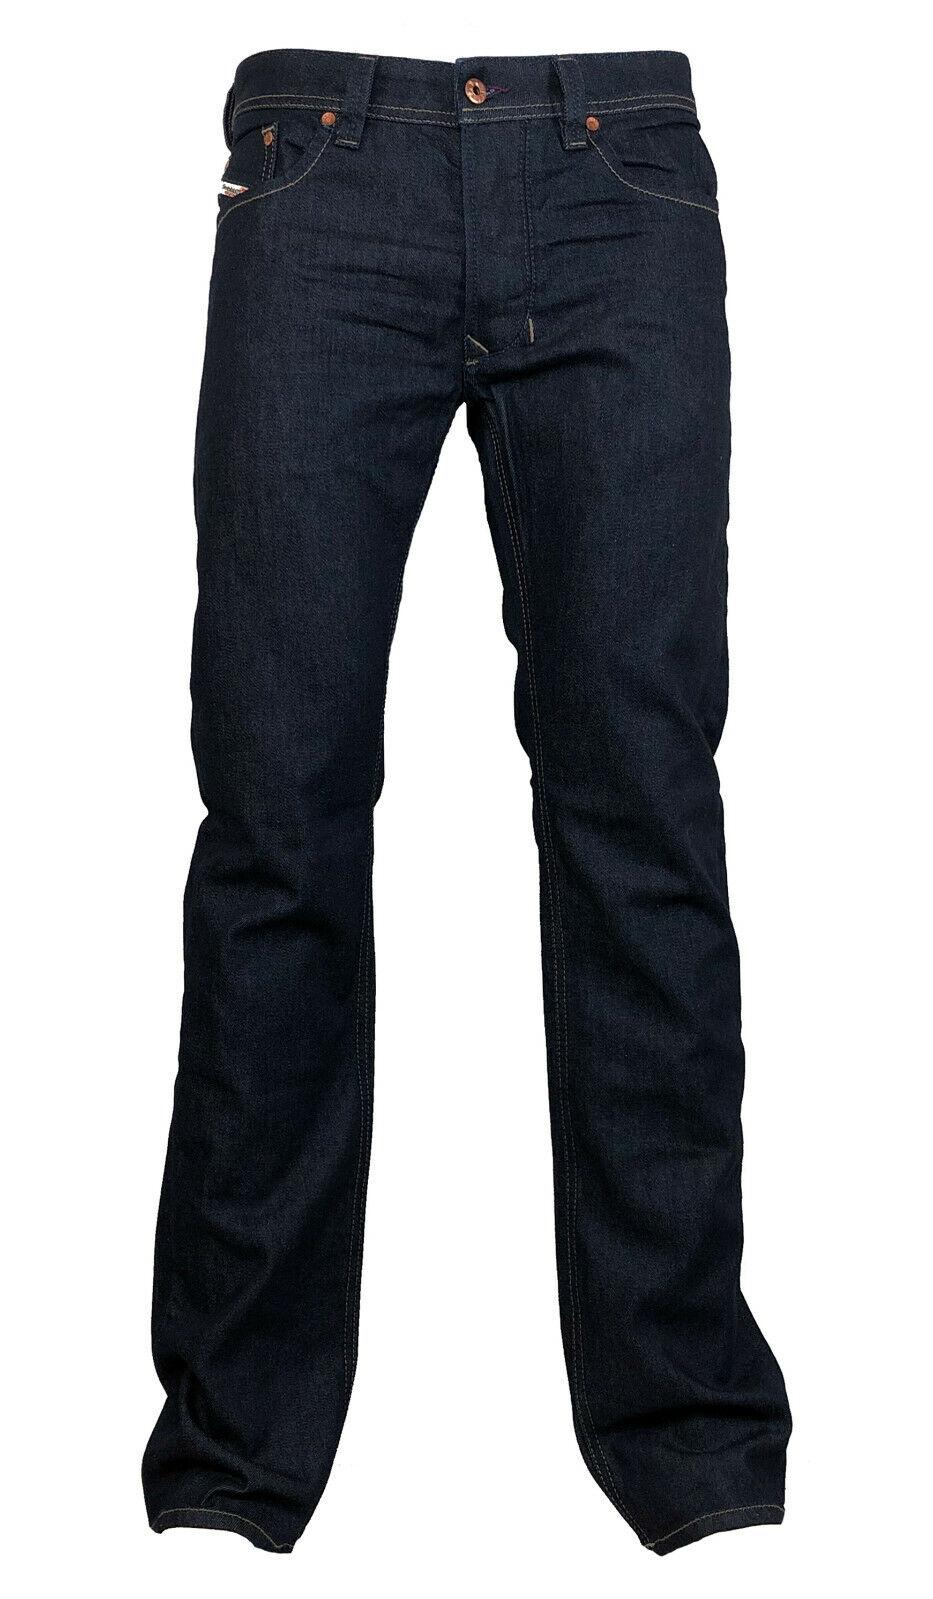 Diesel Straight-Cut Stretch Jeans LARKEE 084HN dunkelblue Gr.  33 30 NEU